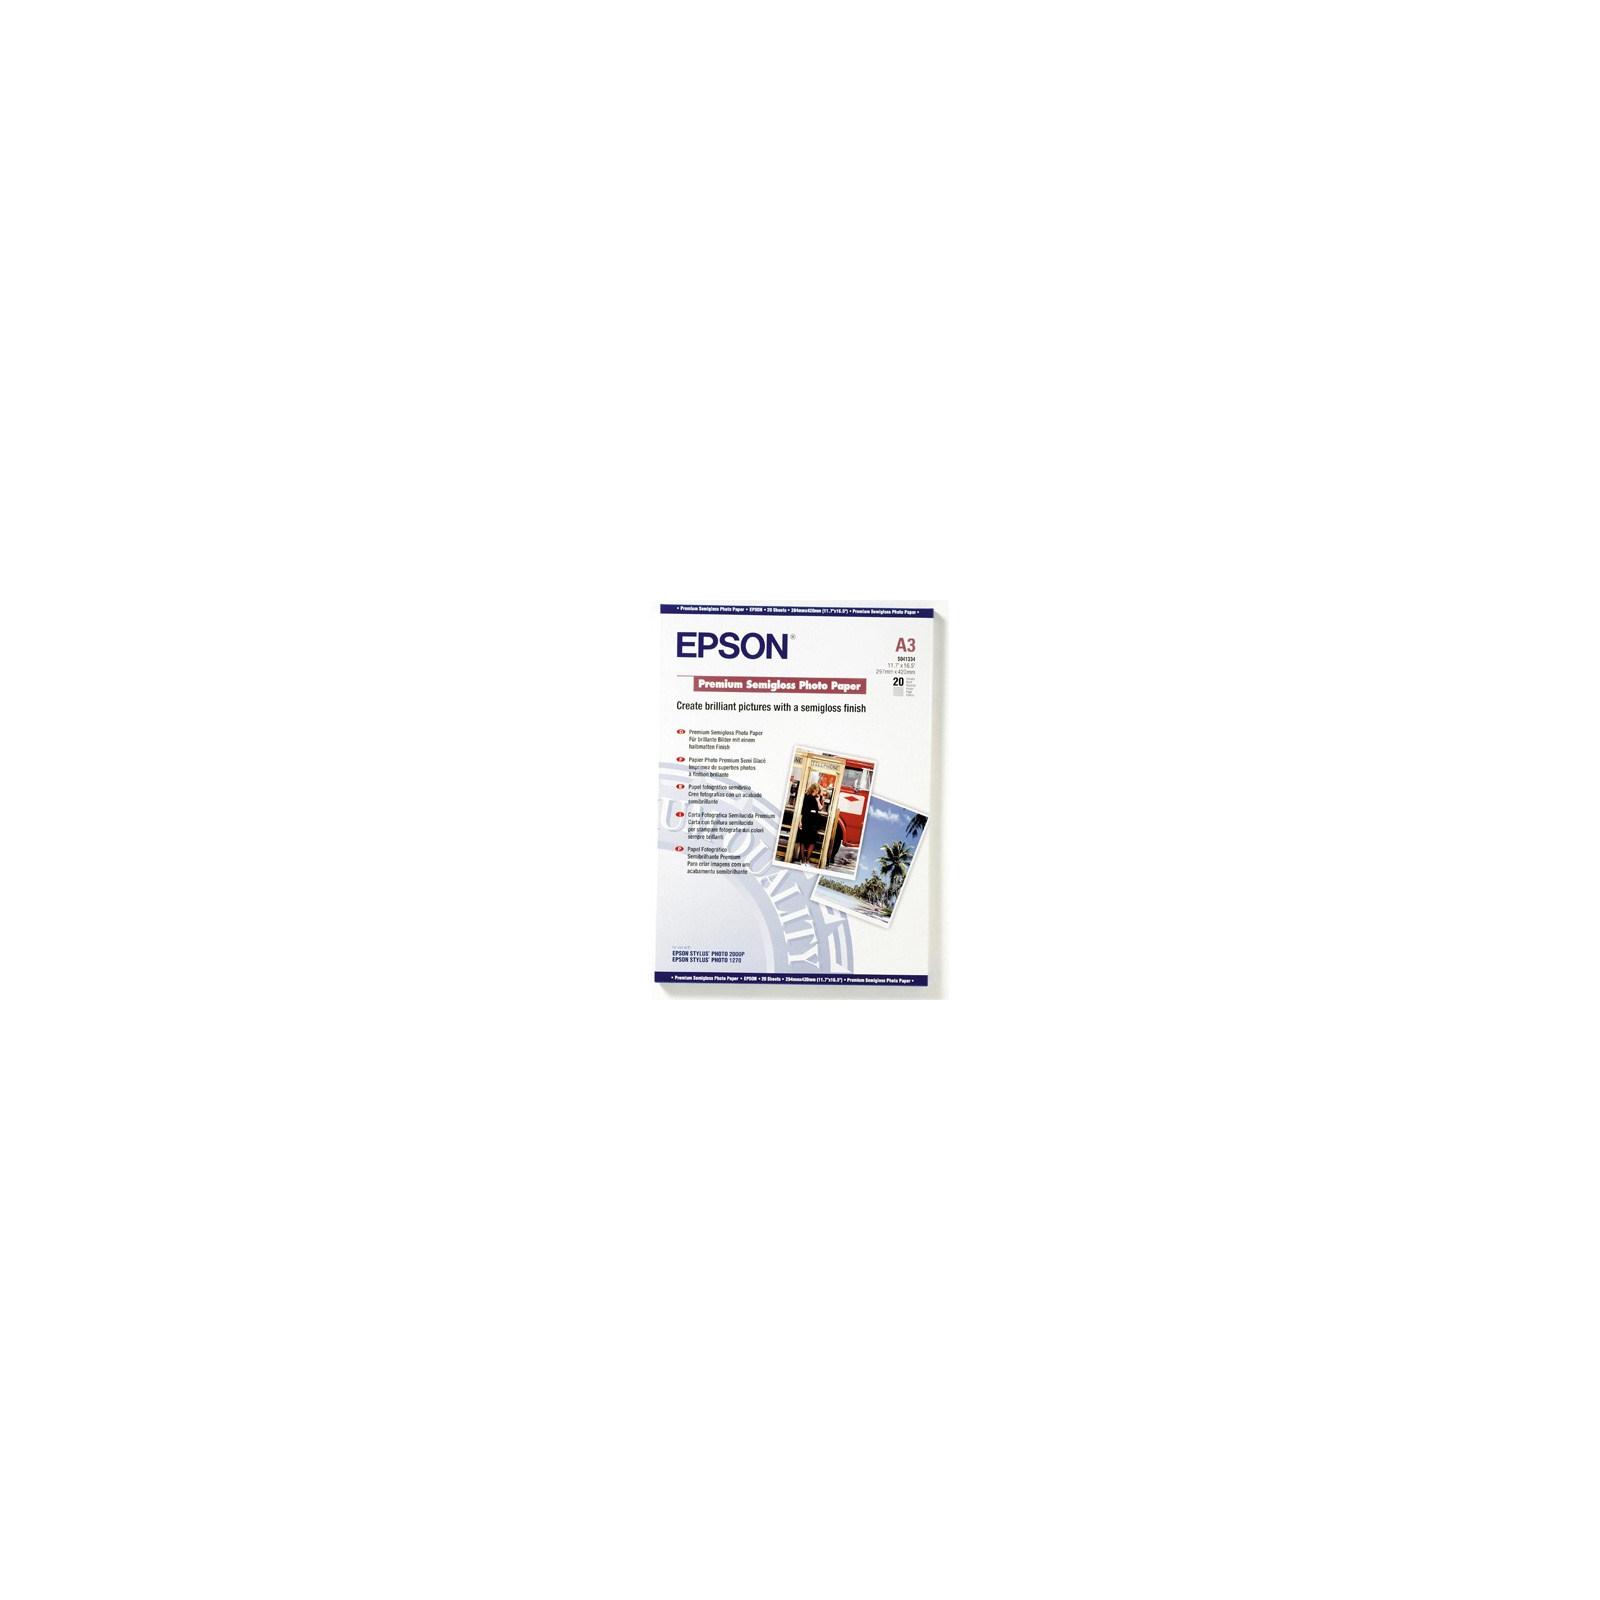 Бумага EPSON A3 Premium Semigloss Photo (C13S041334)